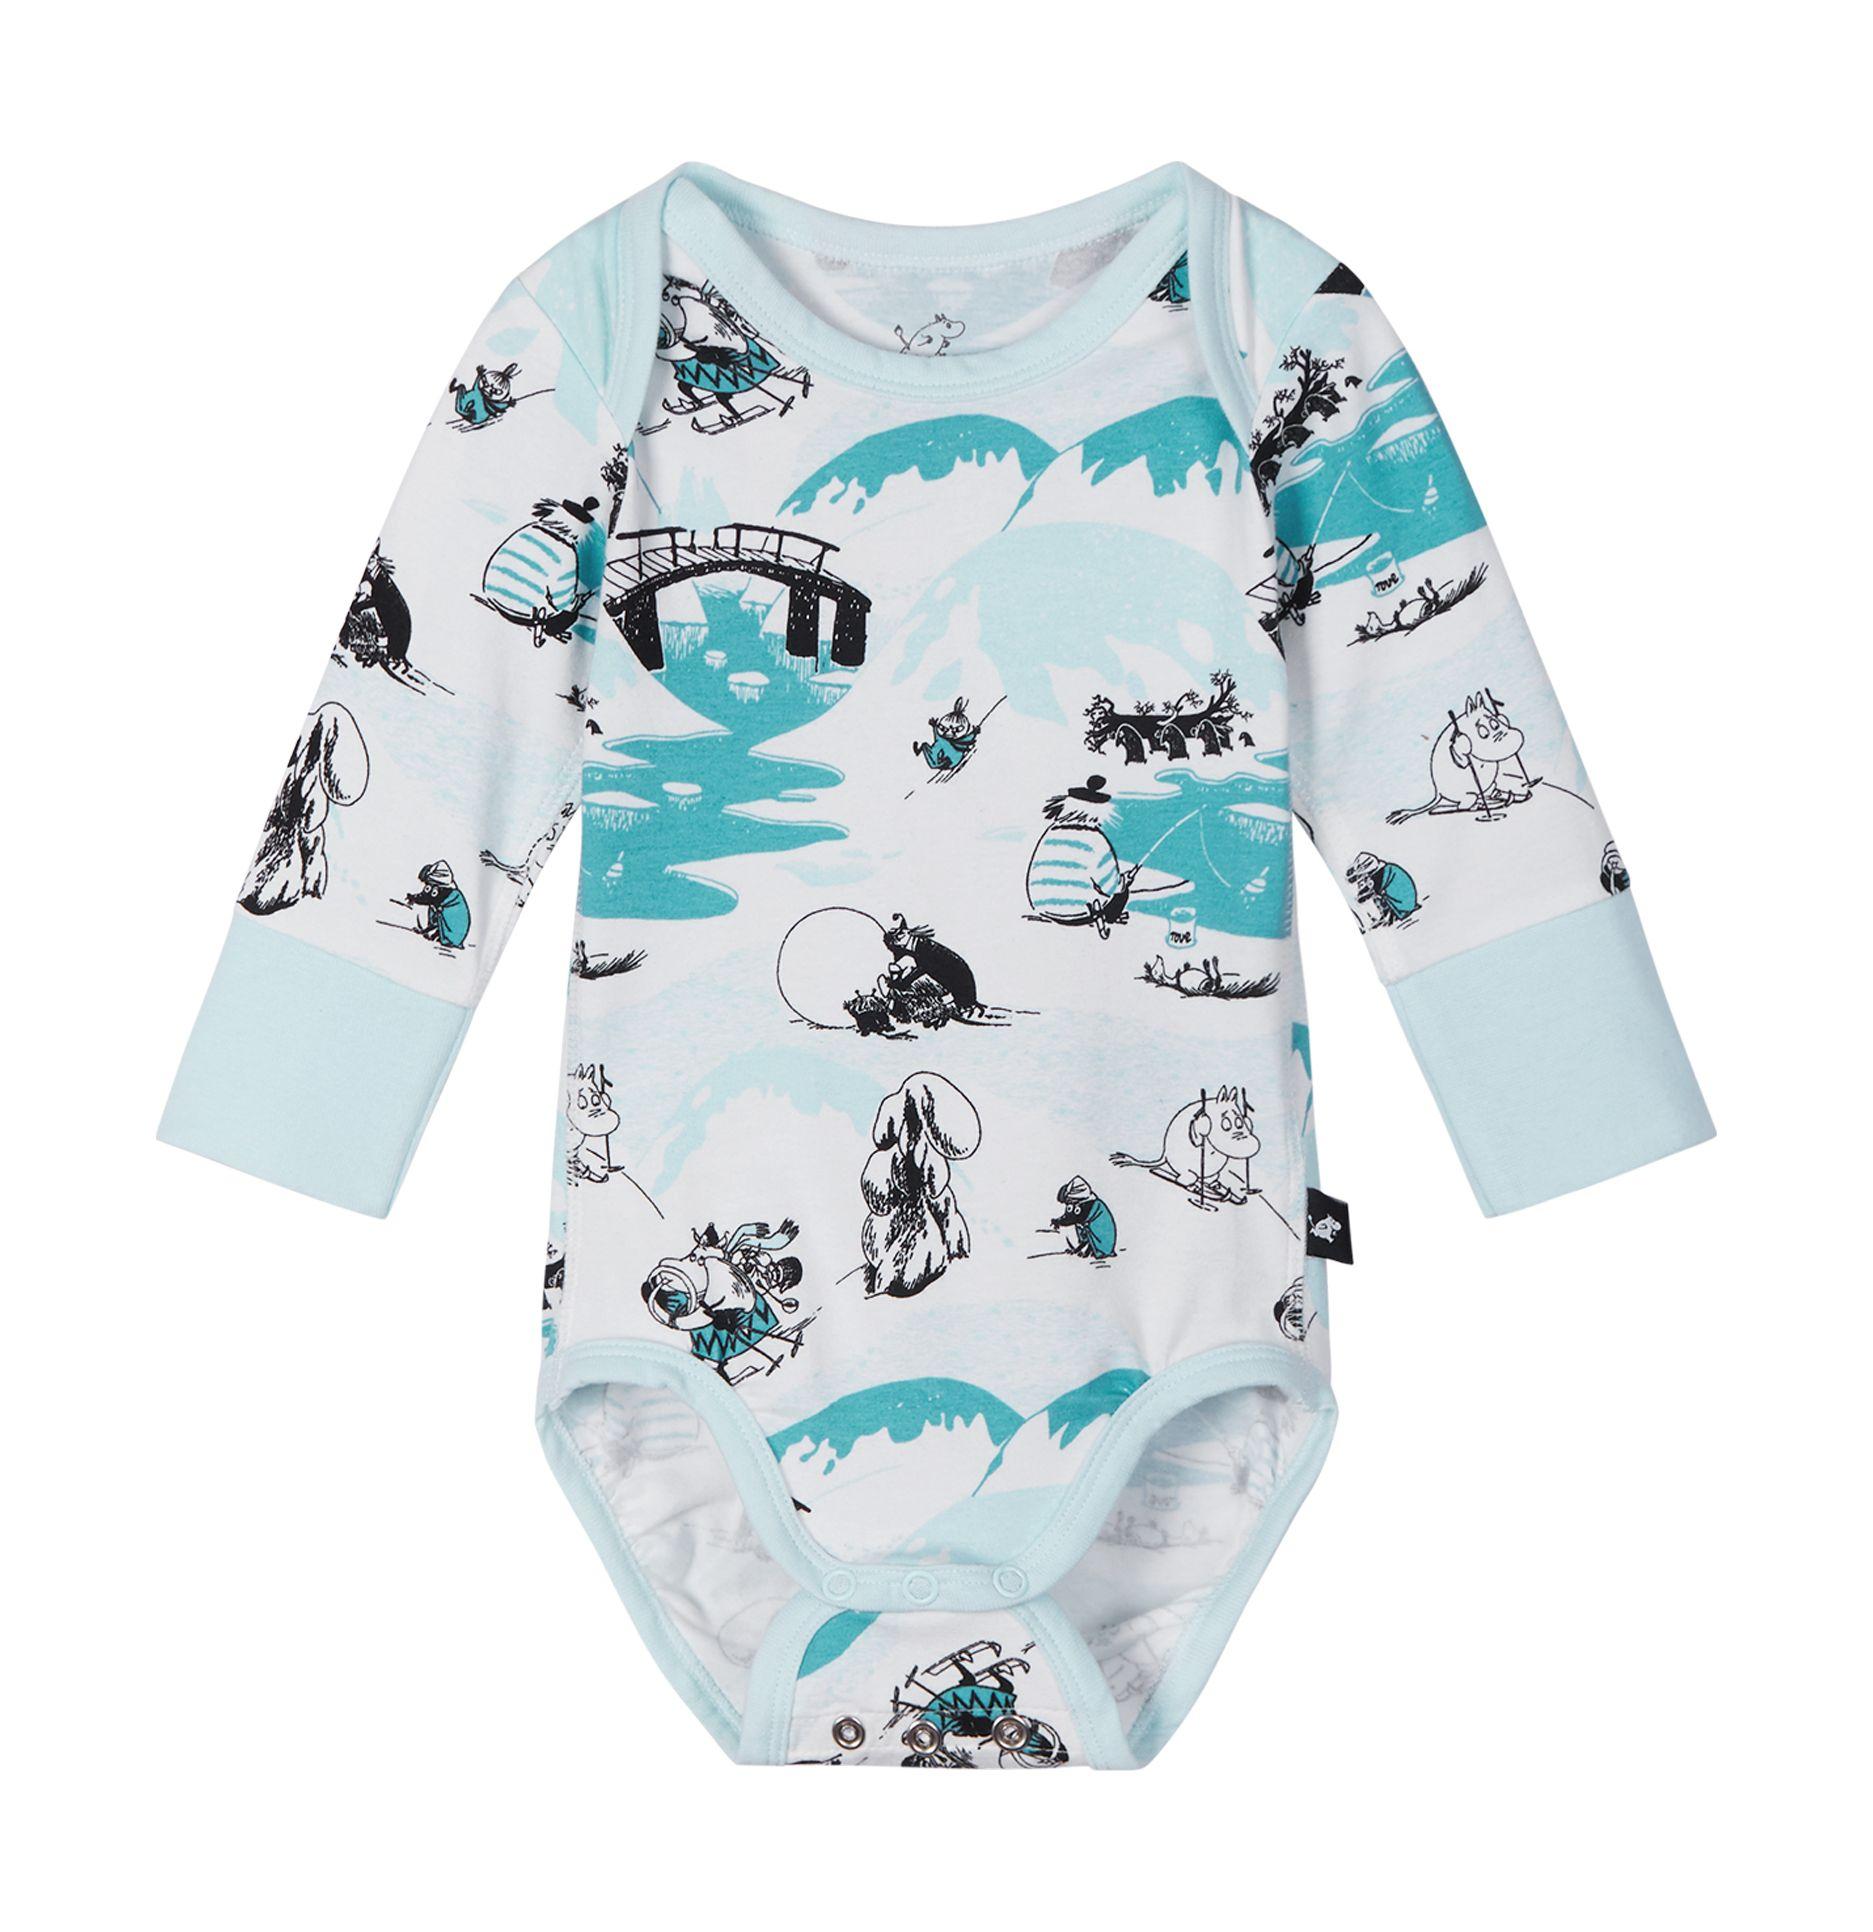 REIMA Moomin Snyggast Baby Blue 68-74